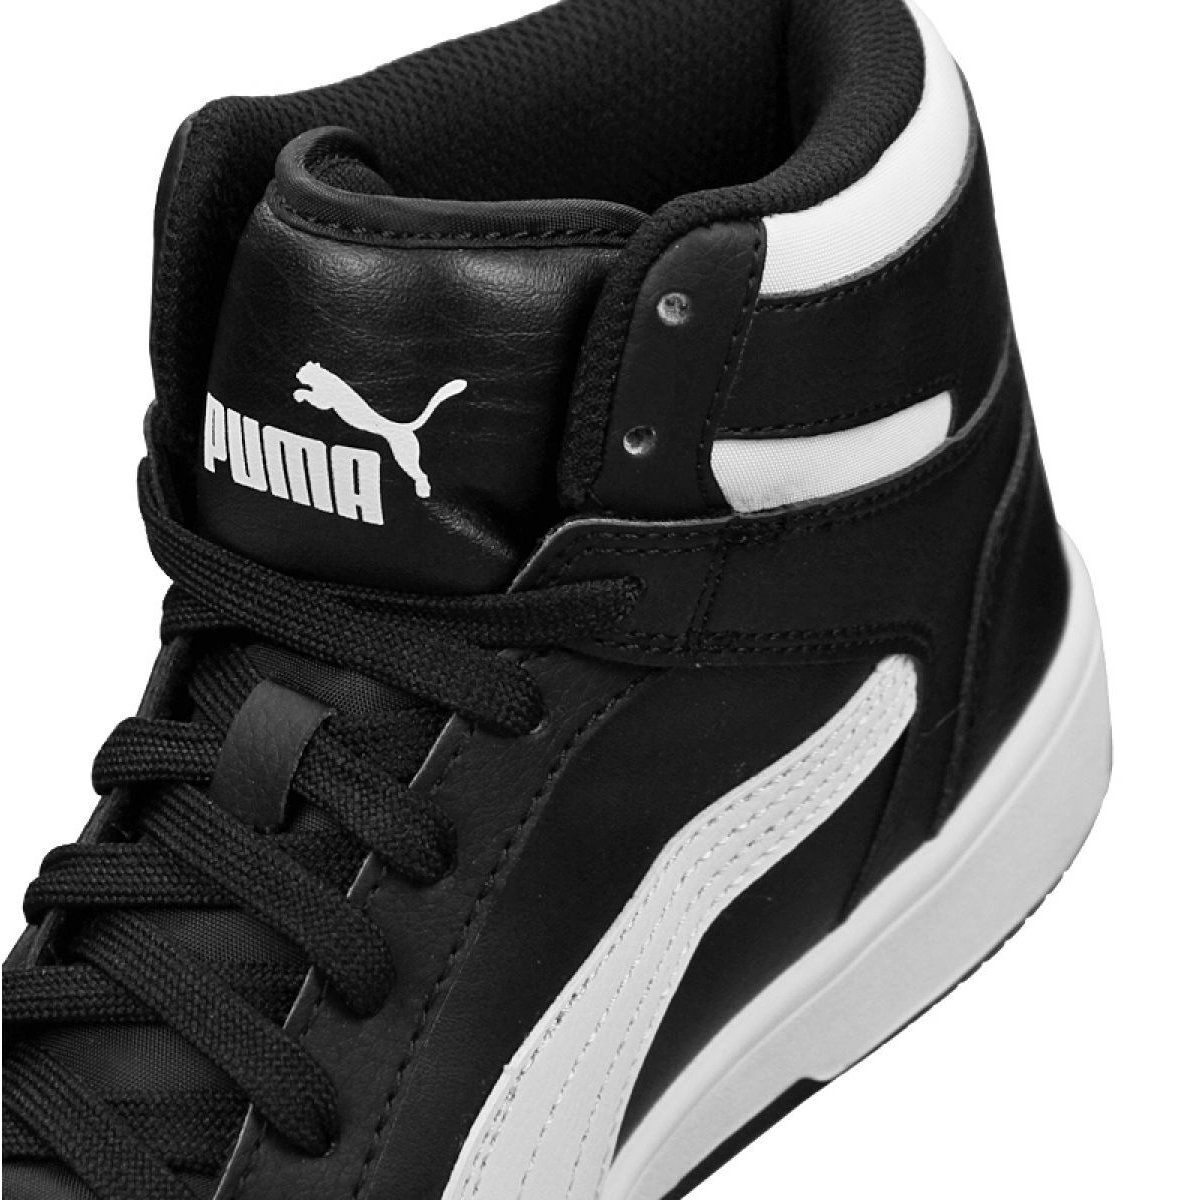 Buty Puma Rebound Layup Sneakers Jr 370486 01 Czarne Junior Shoes Black Shoes Sneakers